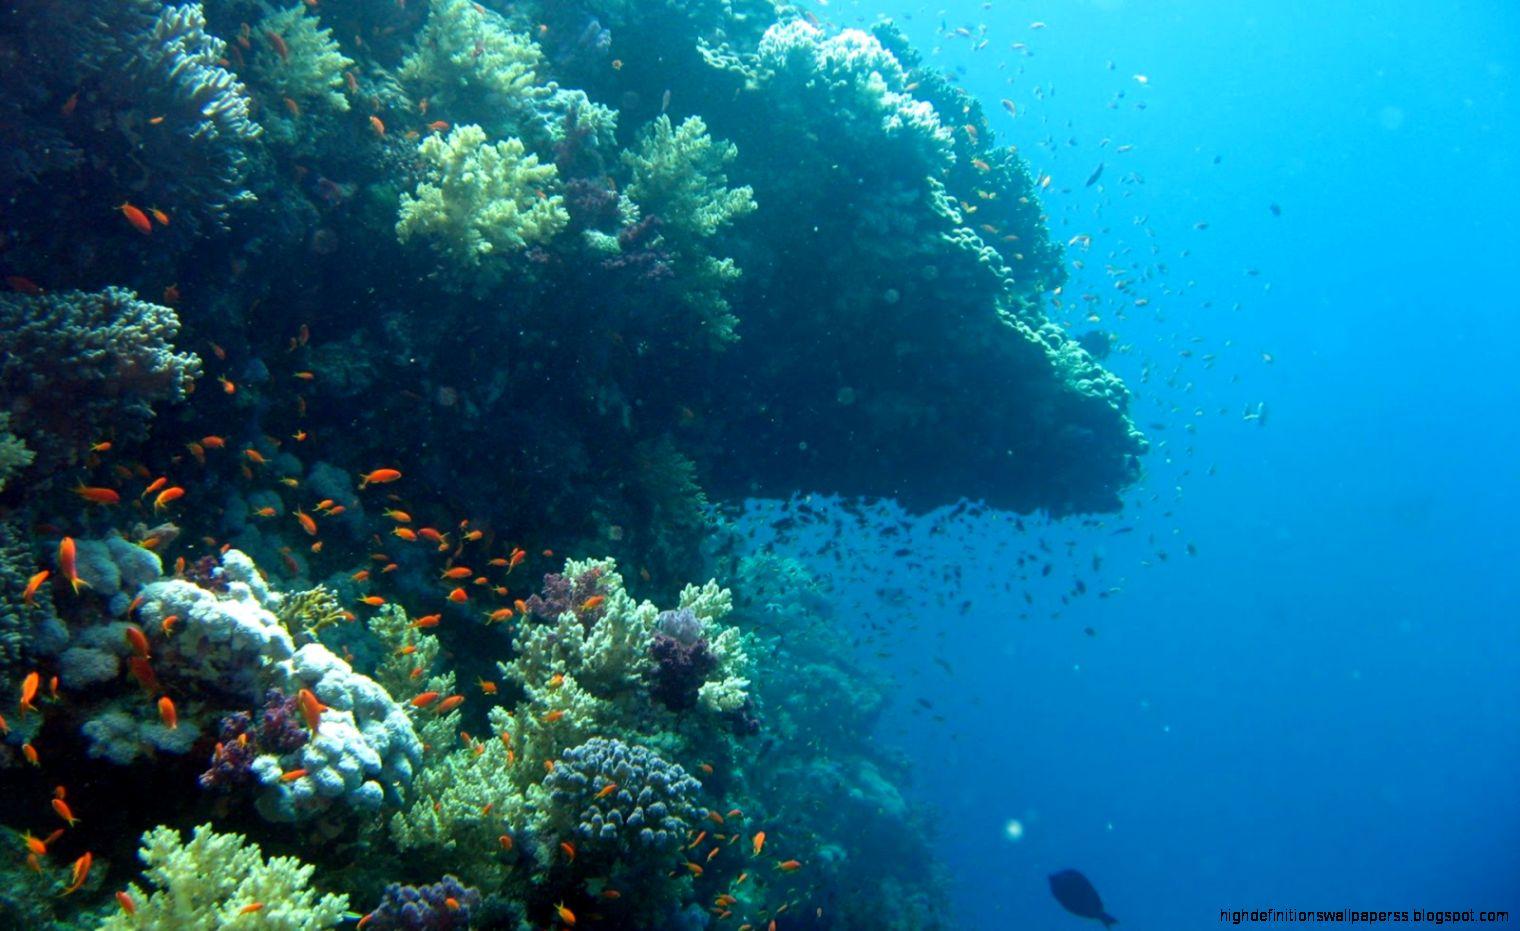 wallpaper calm sea underwater wallpaper hd desktop high